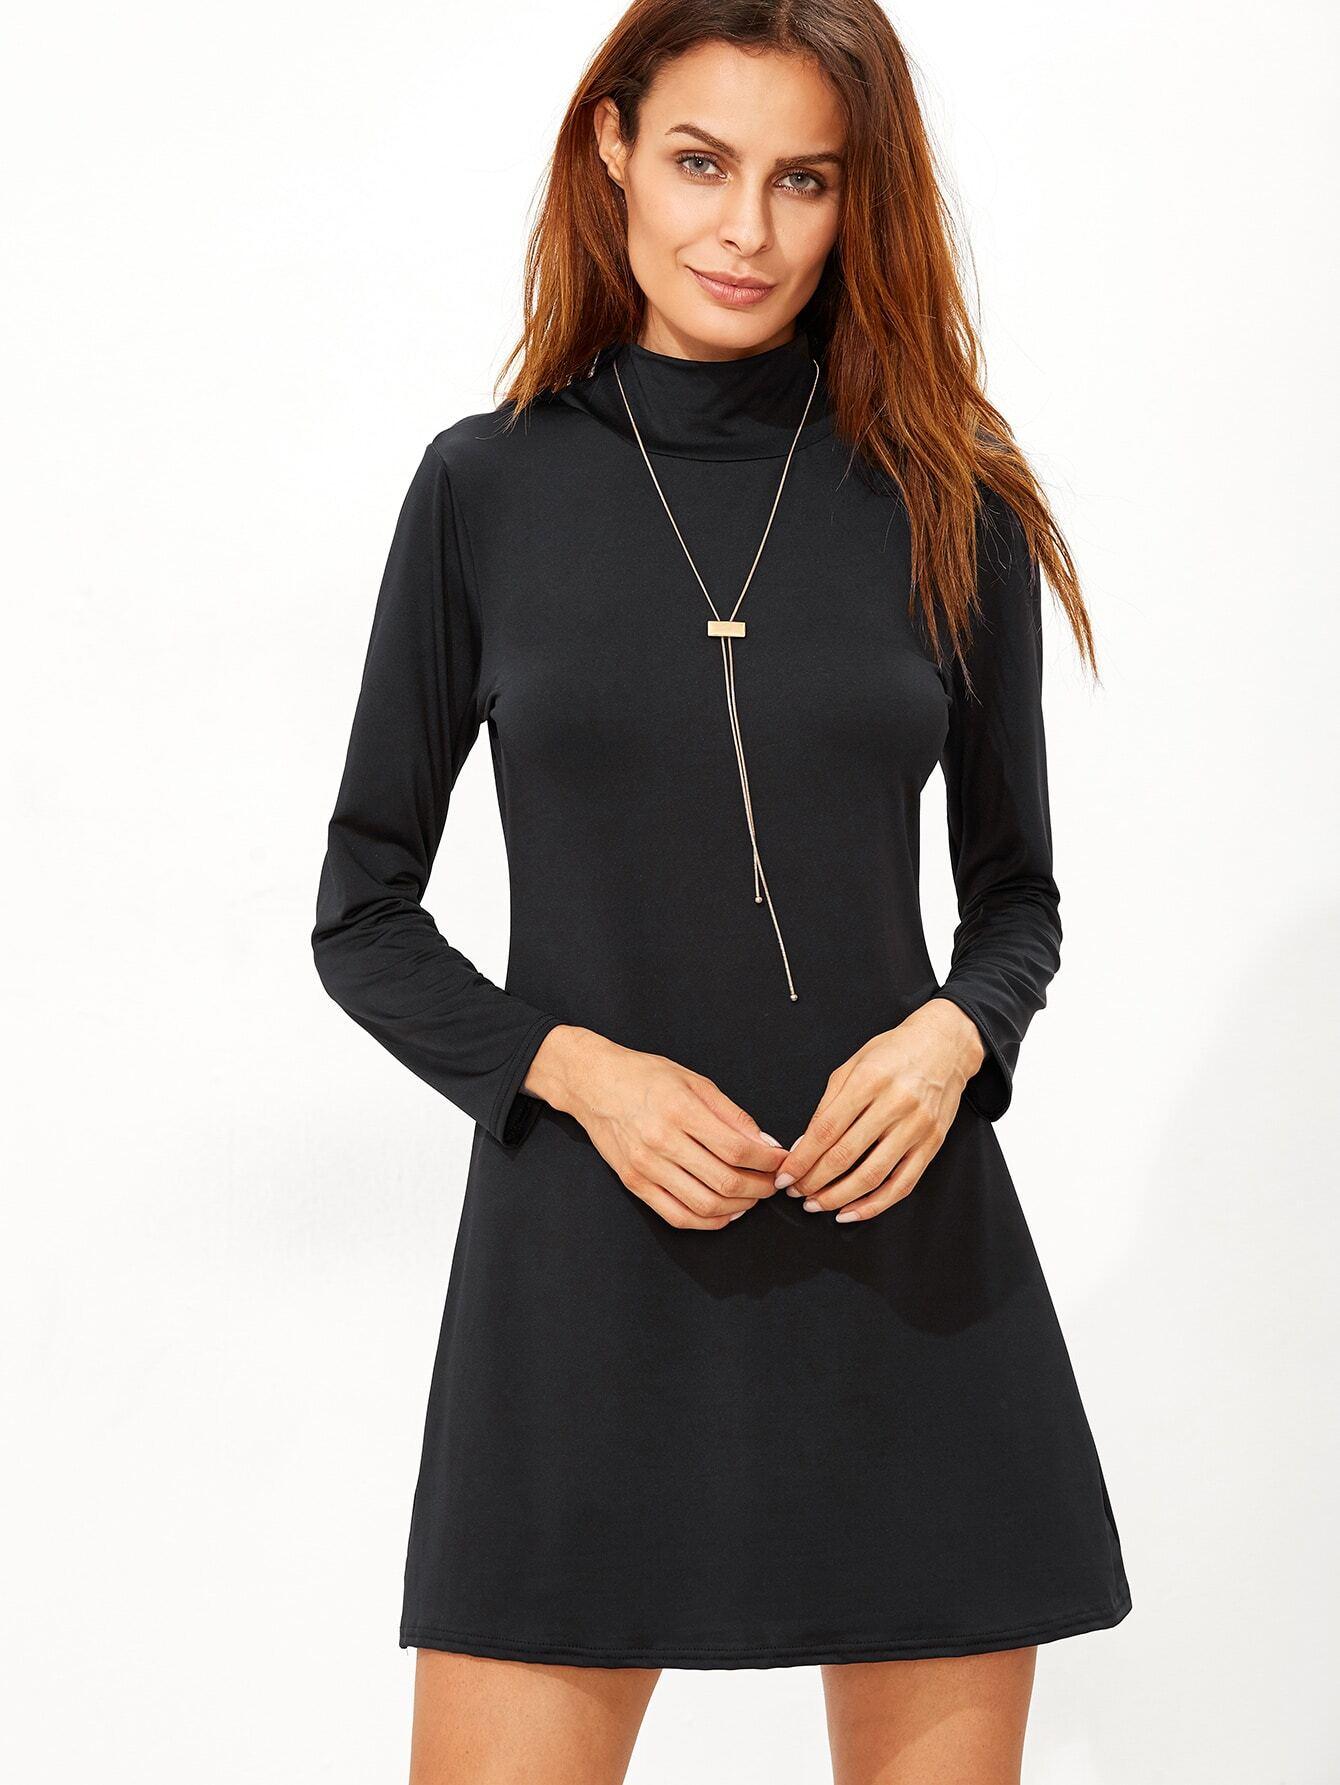 Black High Neck T-shirt Dress EmmaCloth-Women Fast Fashion Online 3c1e2cbdb